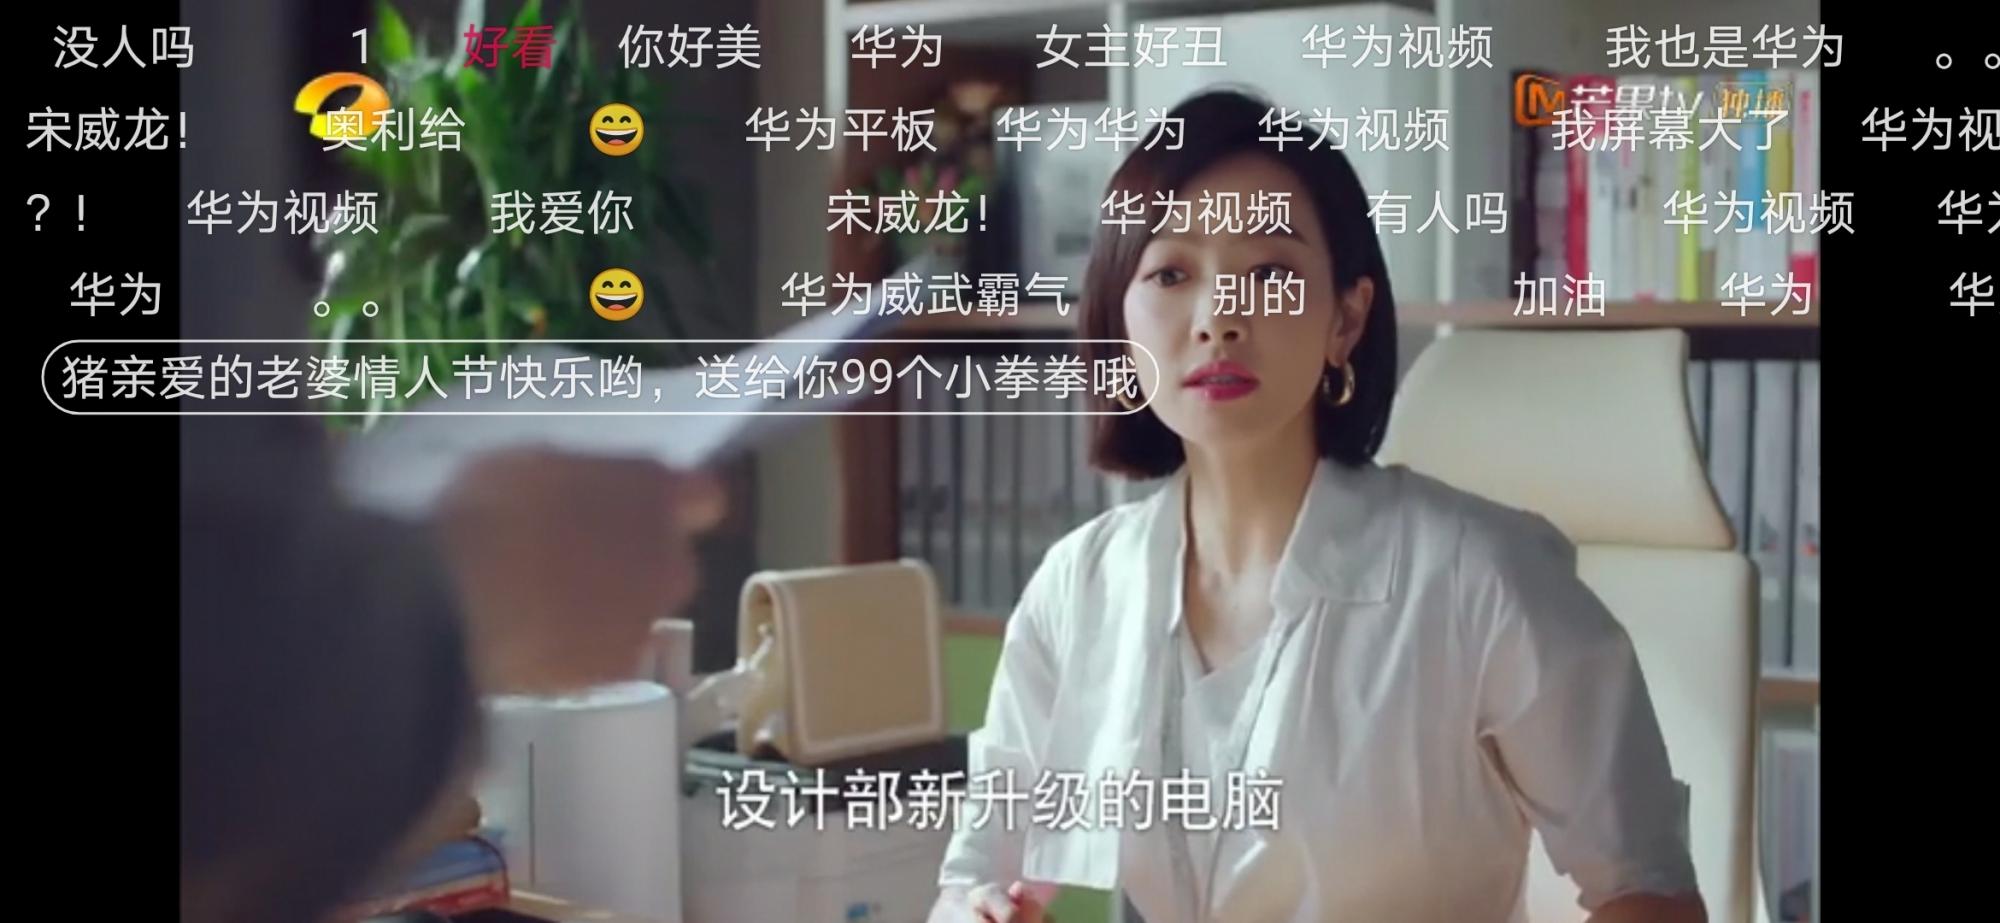 Screenshot_20200214_122220_com.huawei.himovie.jpg